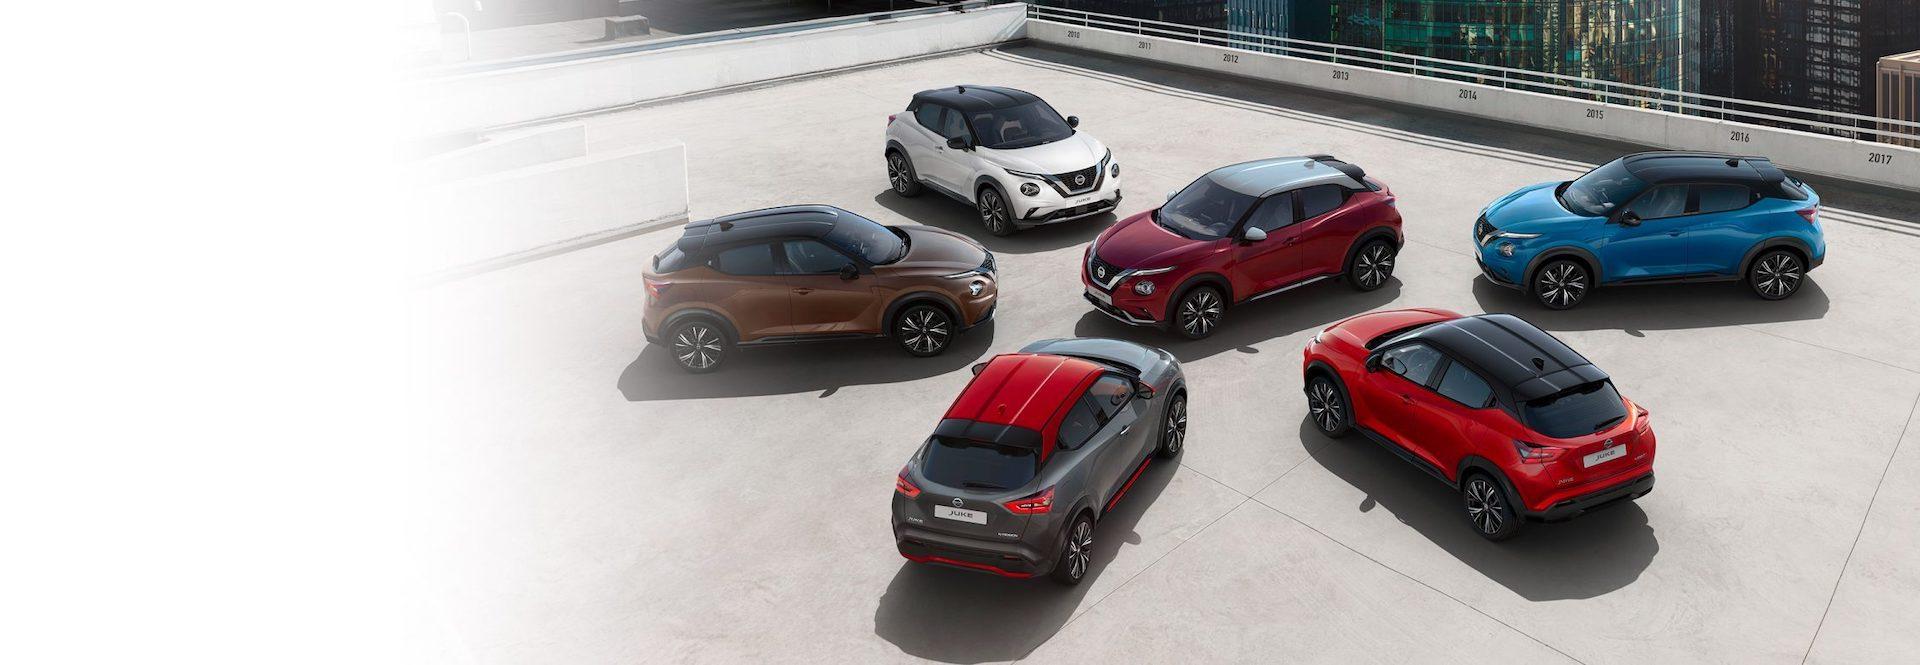 versões de cores do Nissan Juke